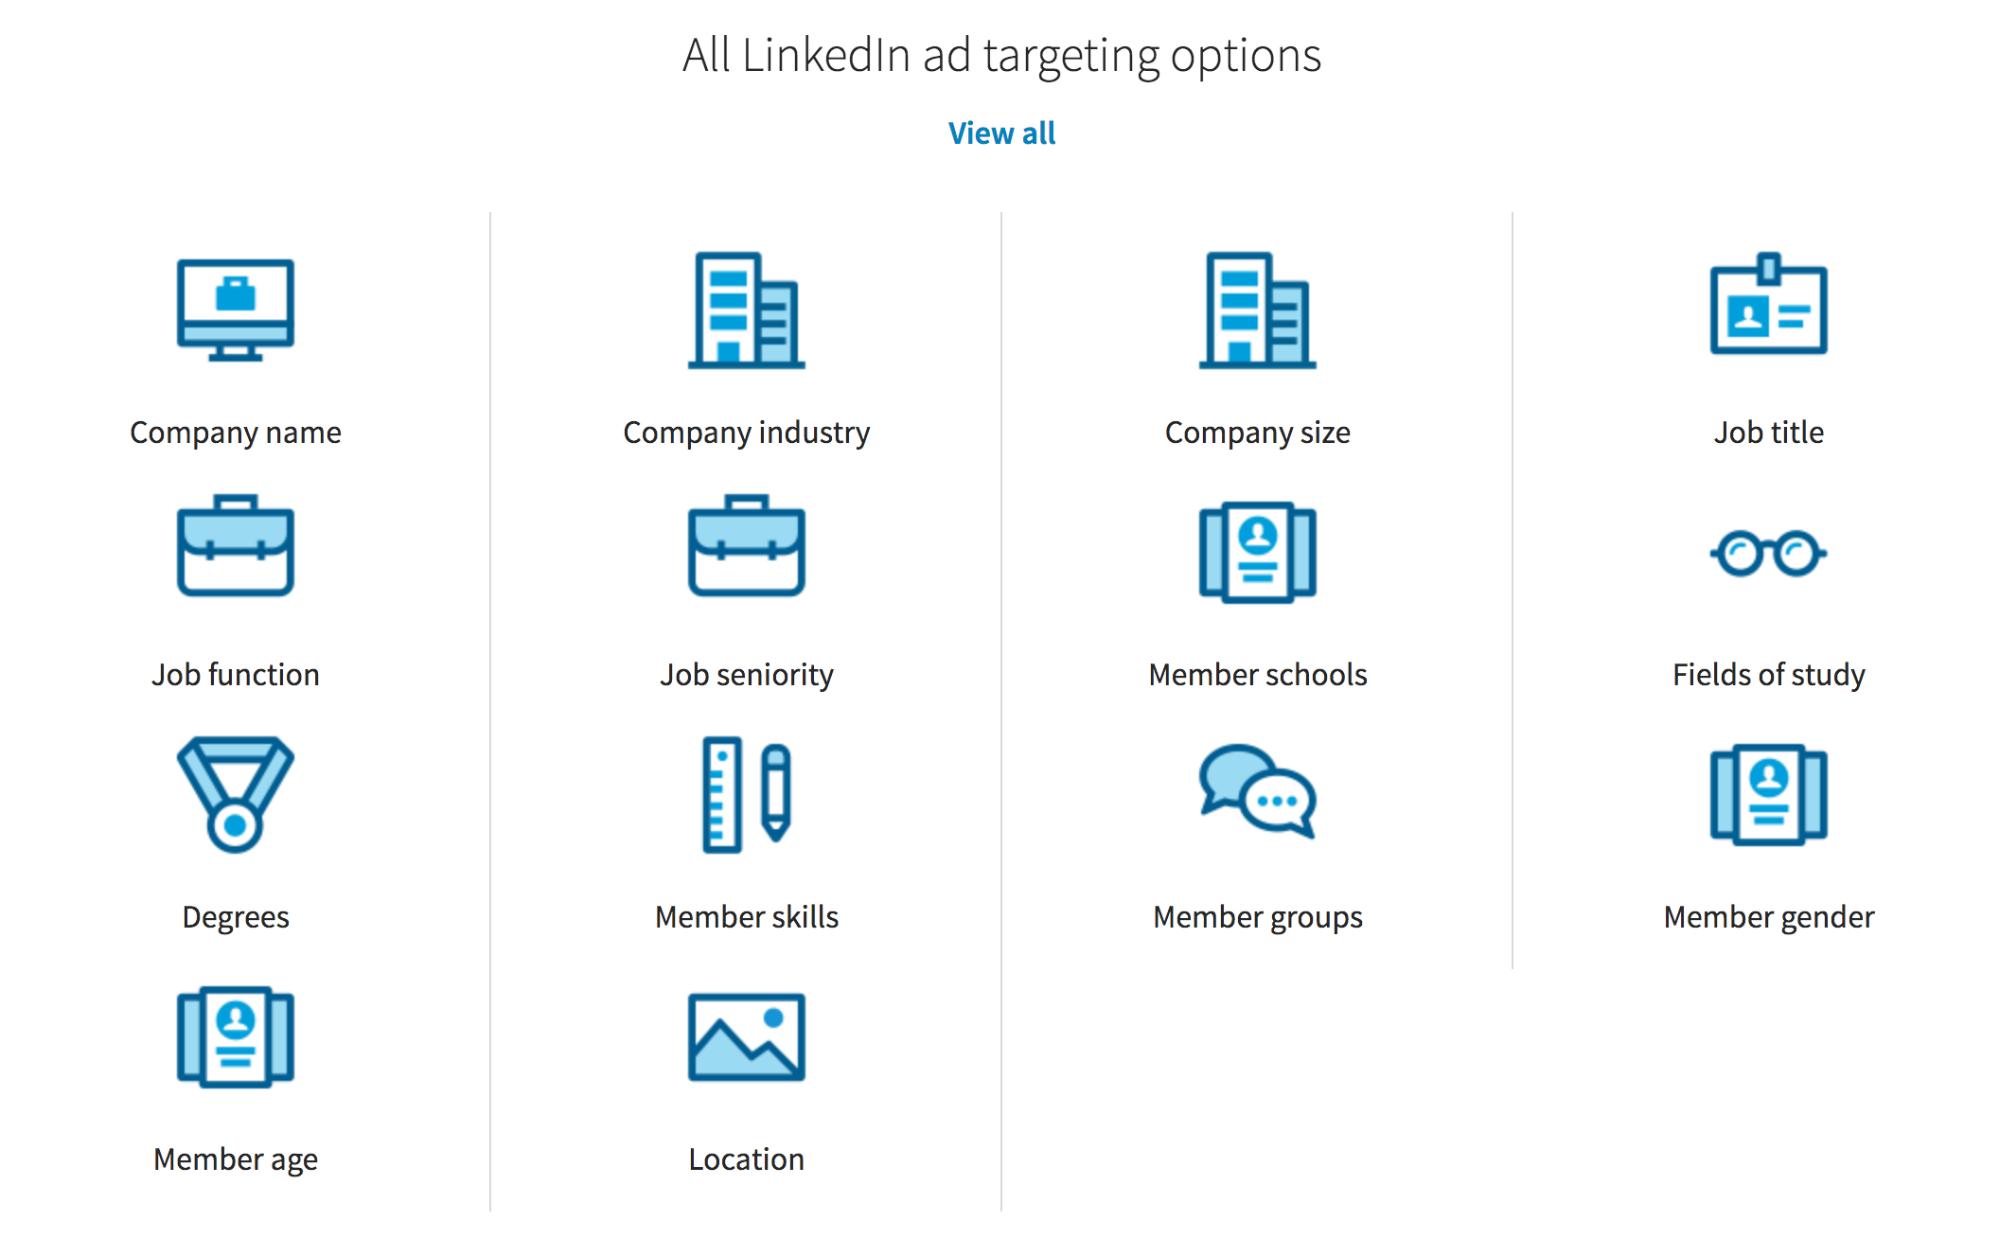 linkedin-ad-targeting-options.png